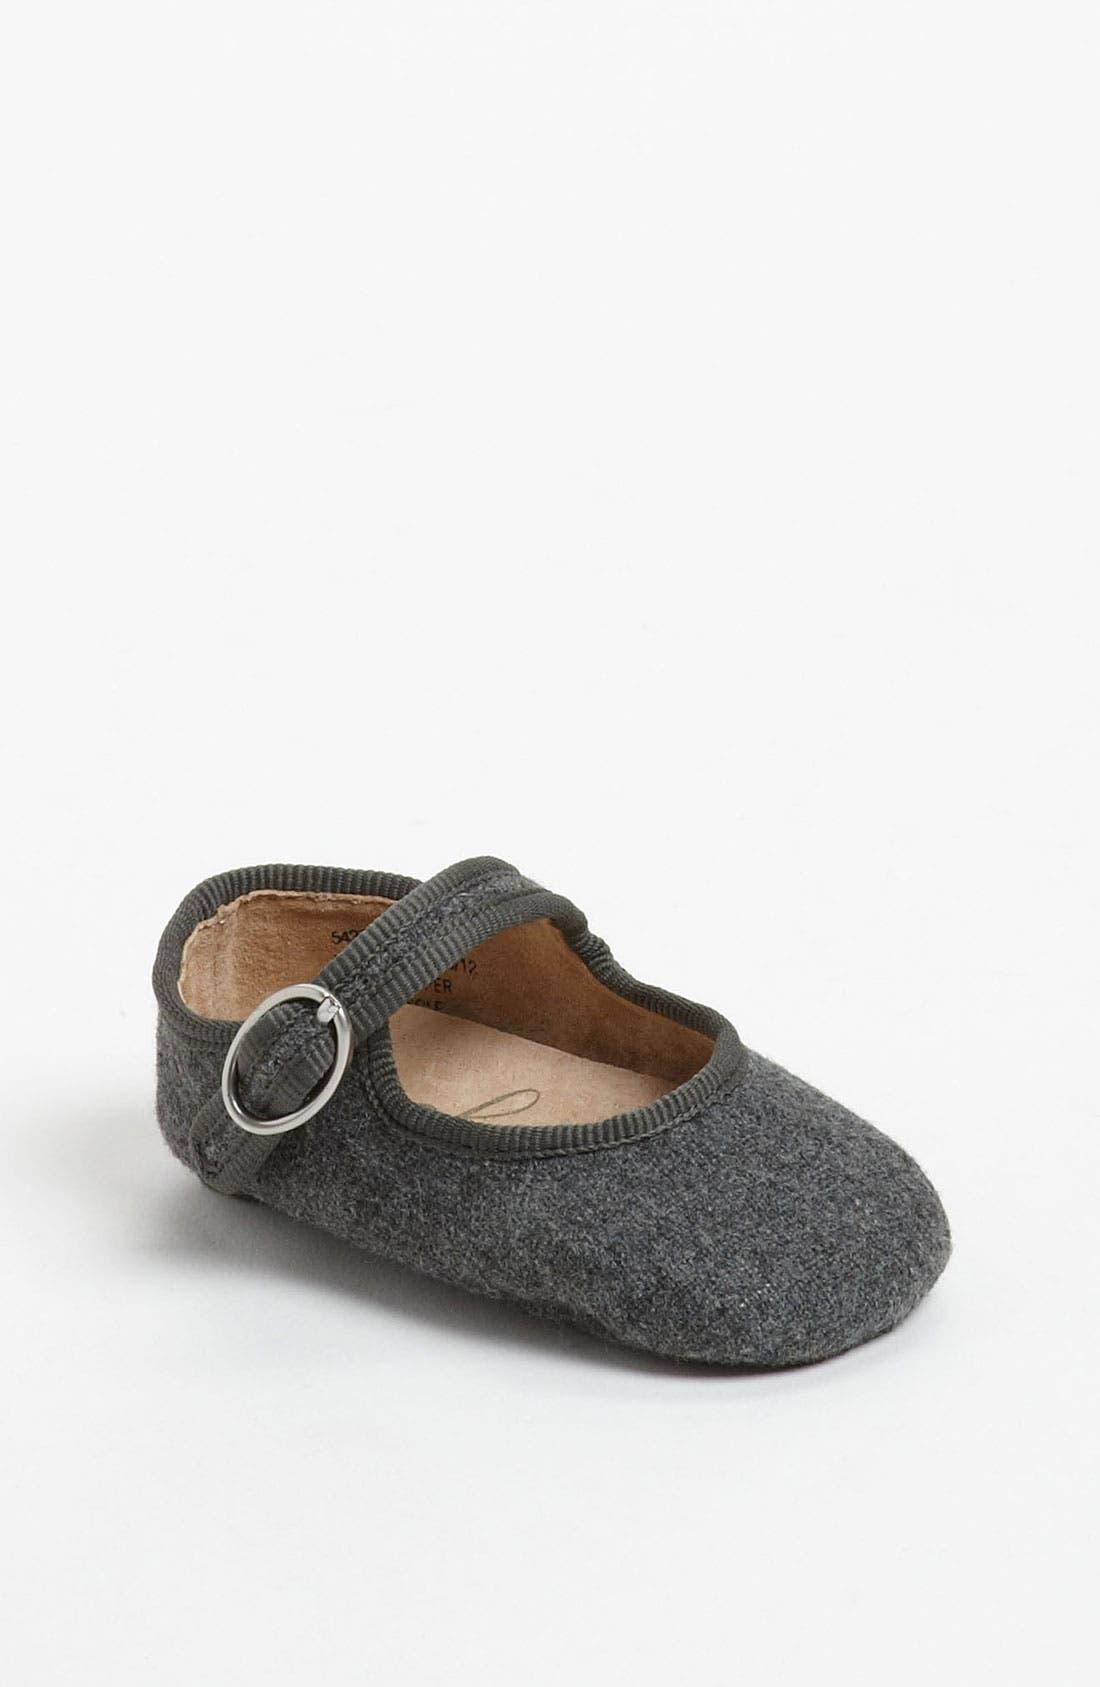 Main Image - Peek 'Baby Poet' Crib Shoe (Baby)